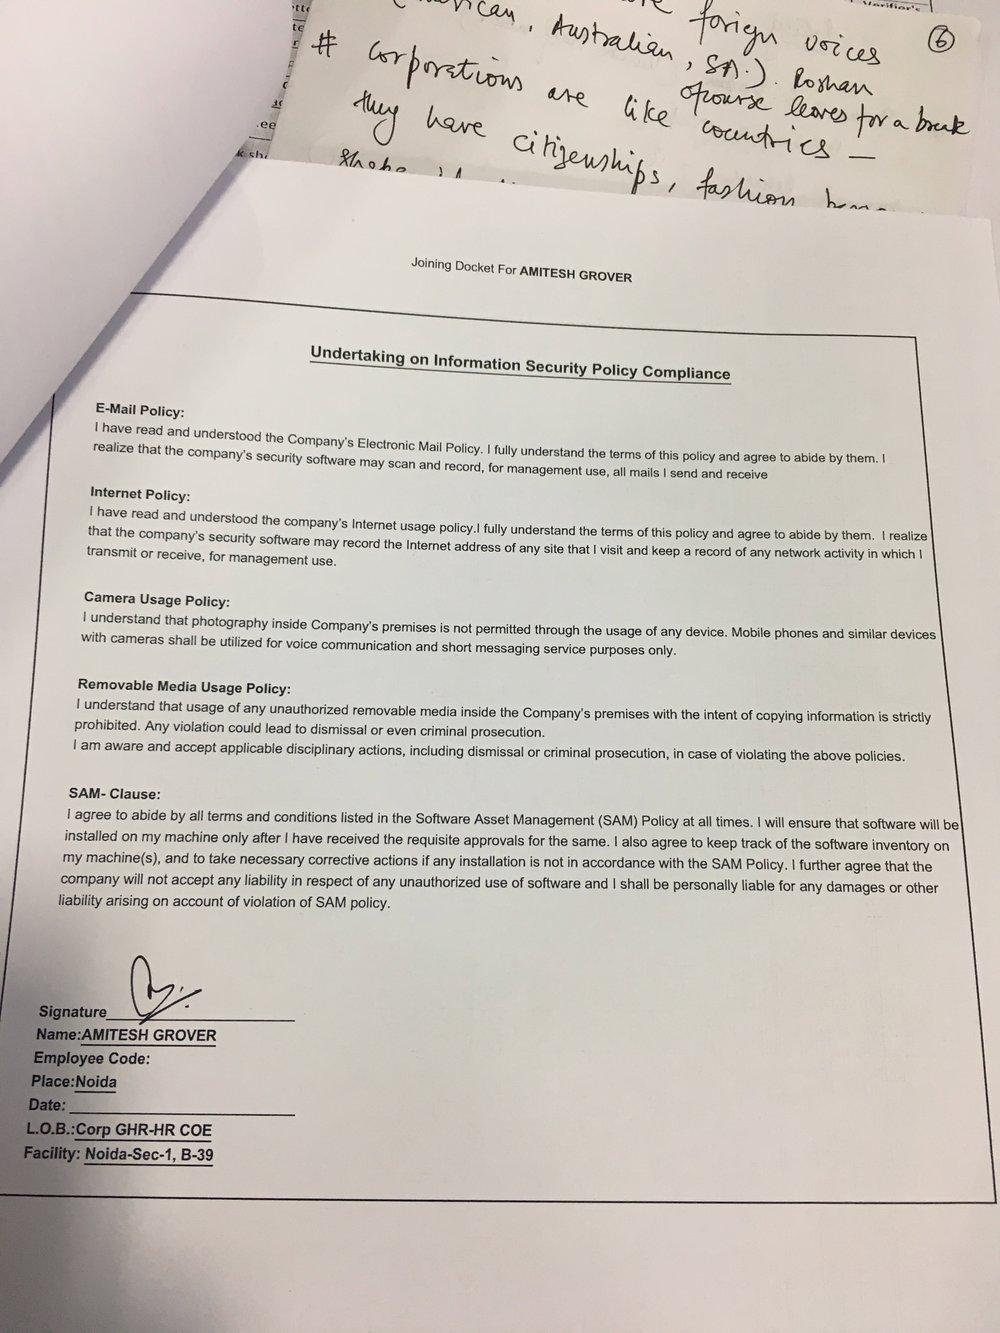 HCL-Amitesh Contract.jpg